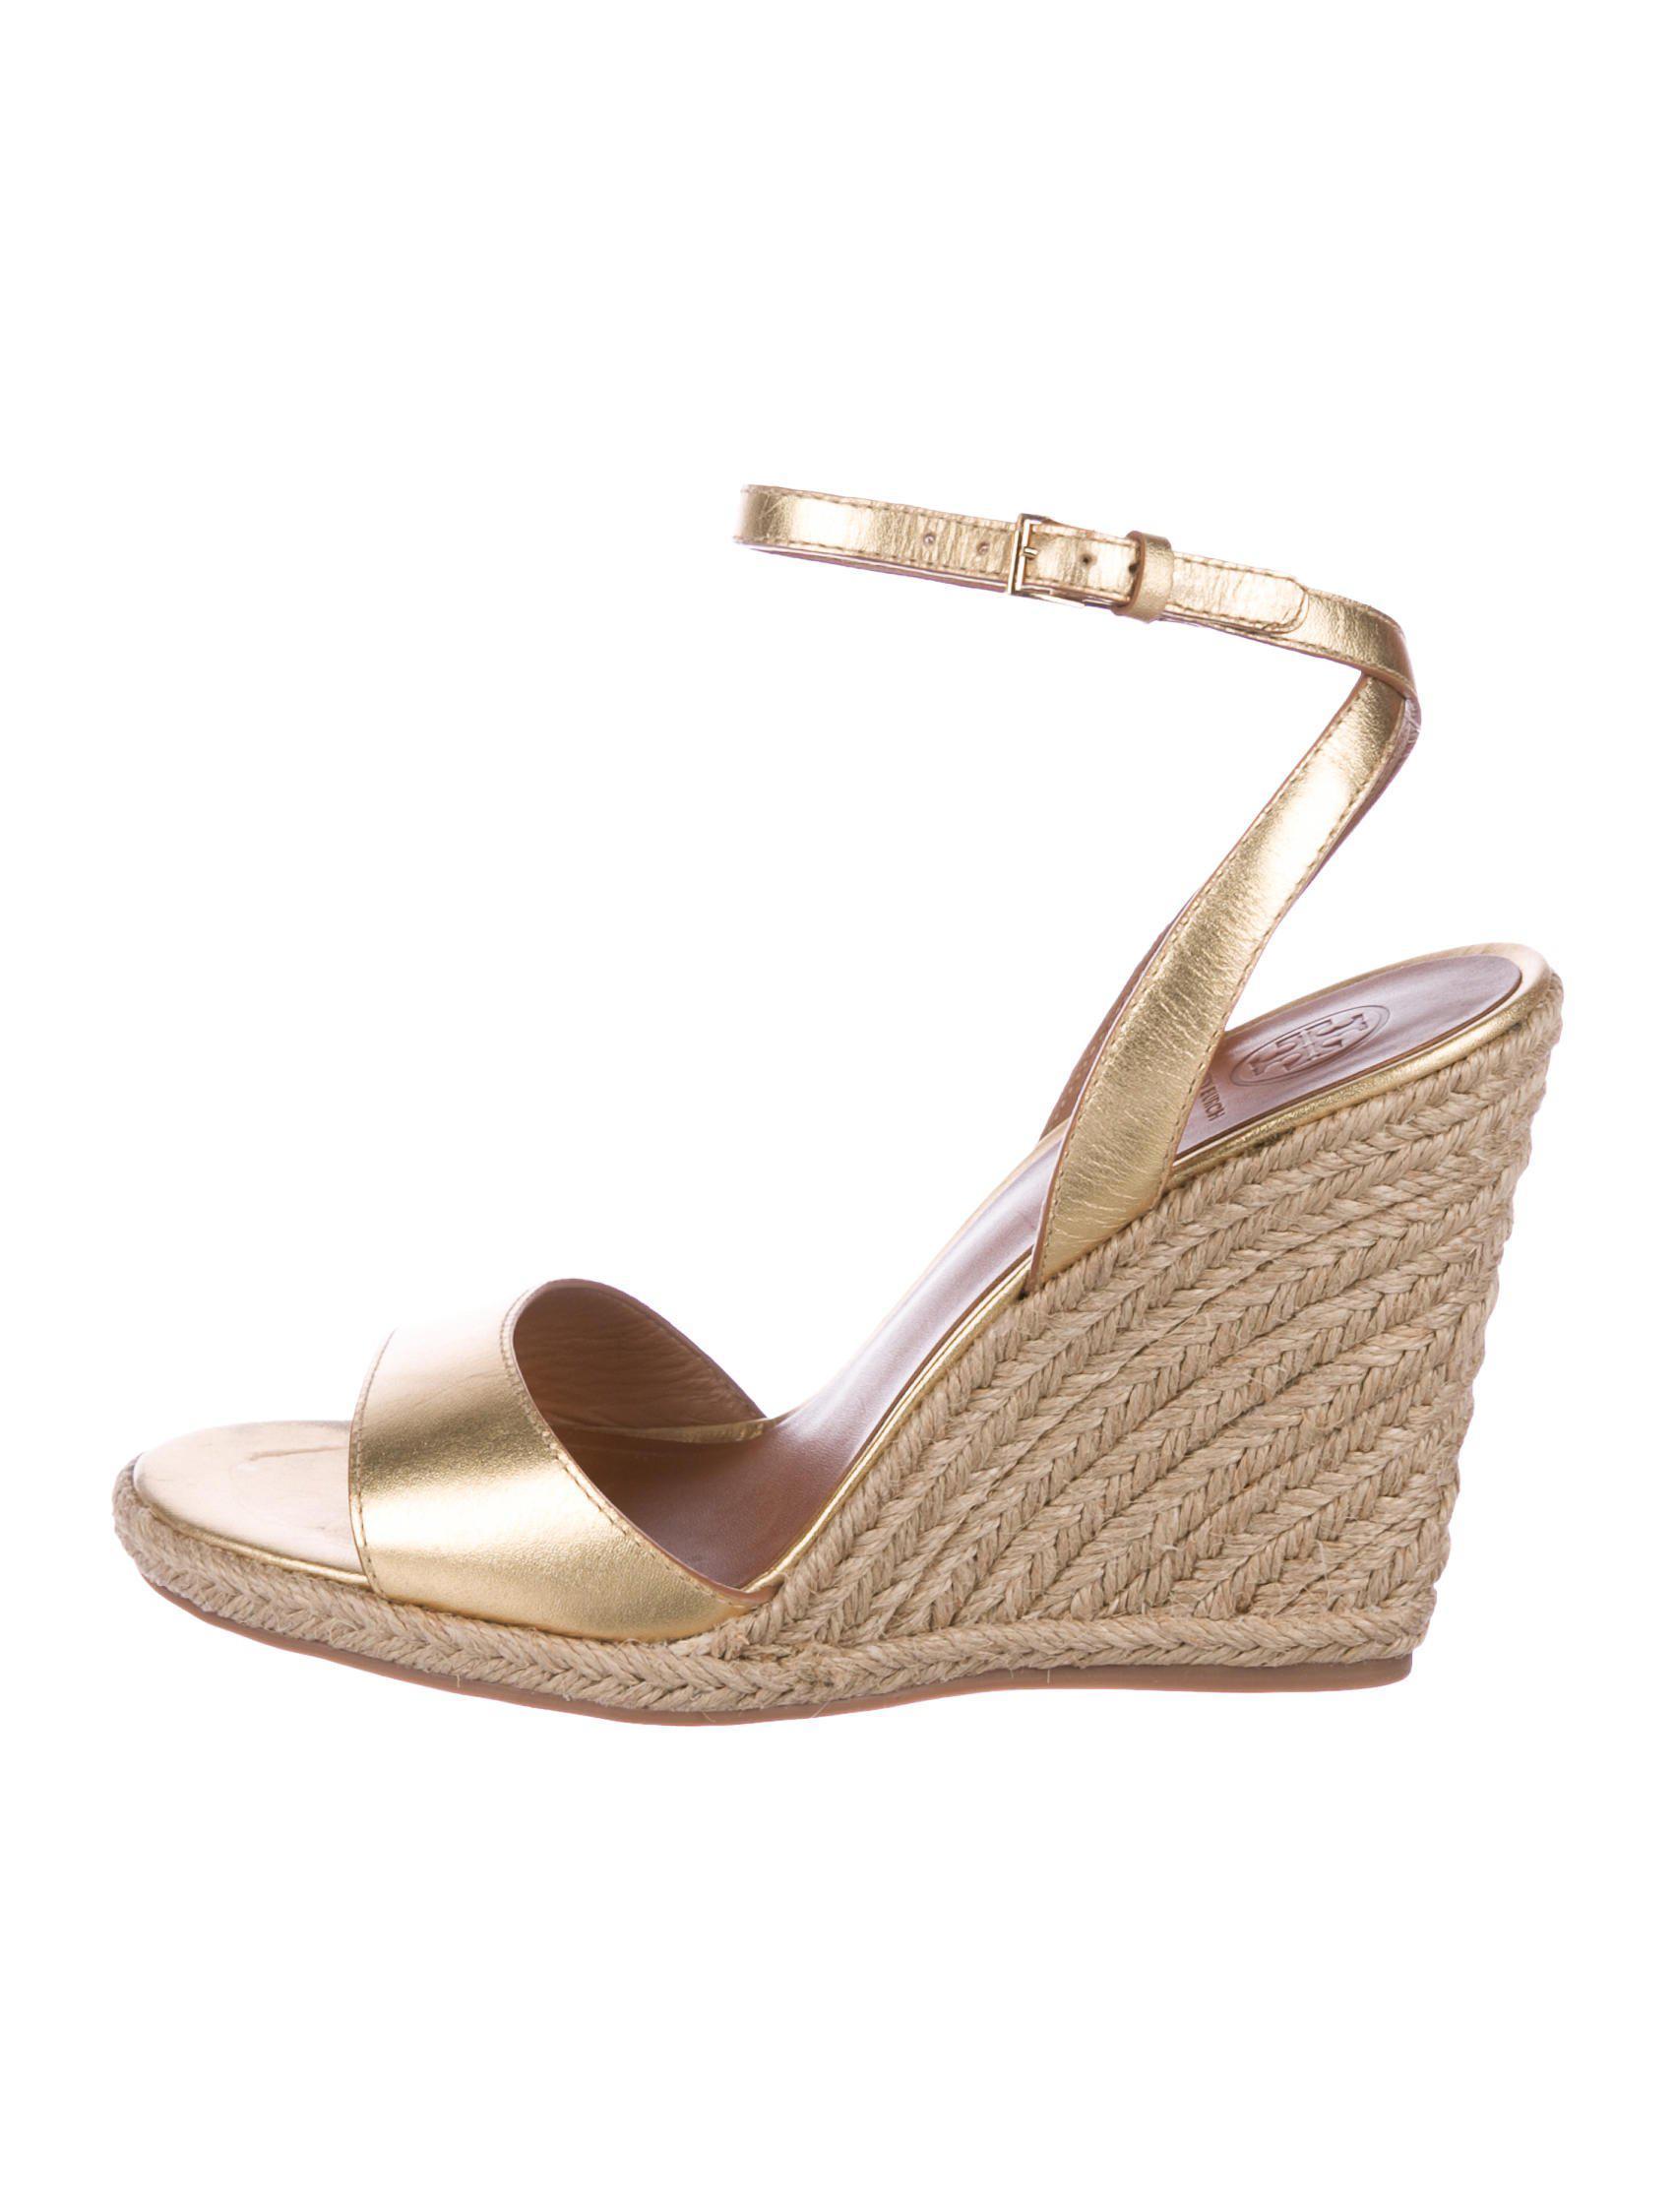 02fae213d Lyst - Tory Burch Cadmina Espadrille Sandals in Metallic